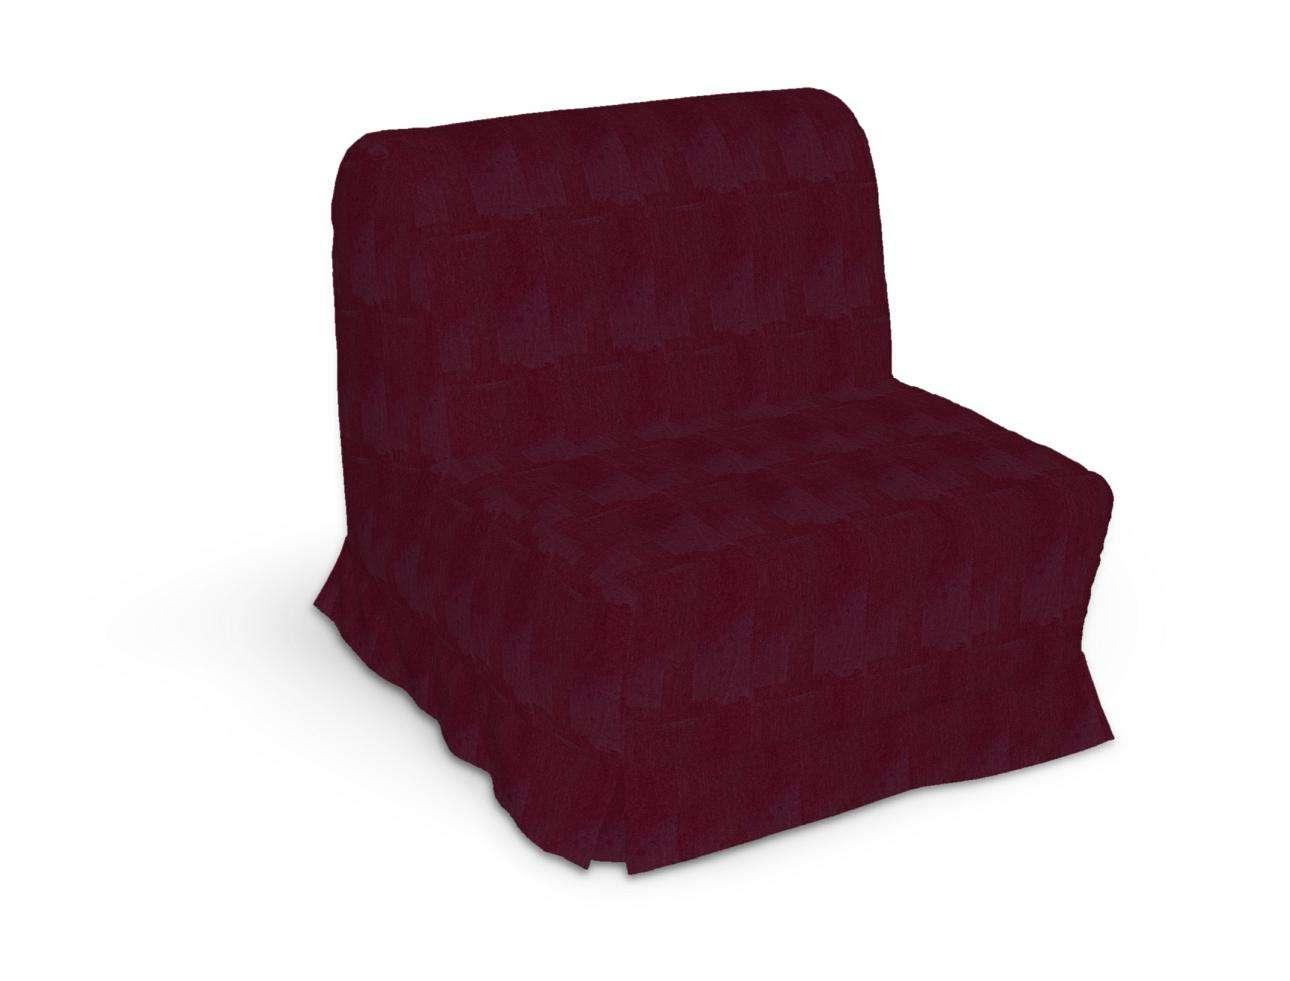 Lycksele Sesselbezug mit Kellerfalten Lycksele von der Kollektion Chenille , Stoff: 702-19